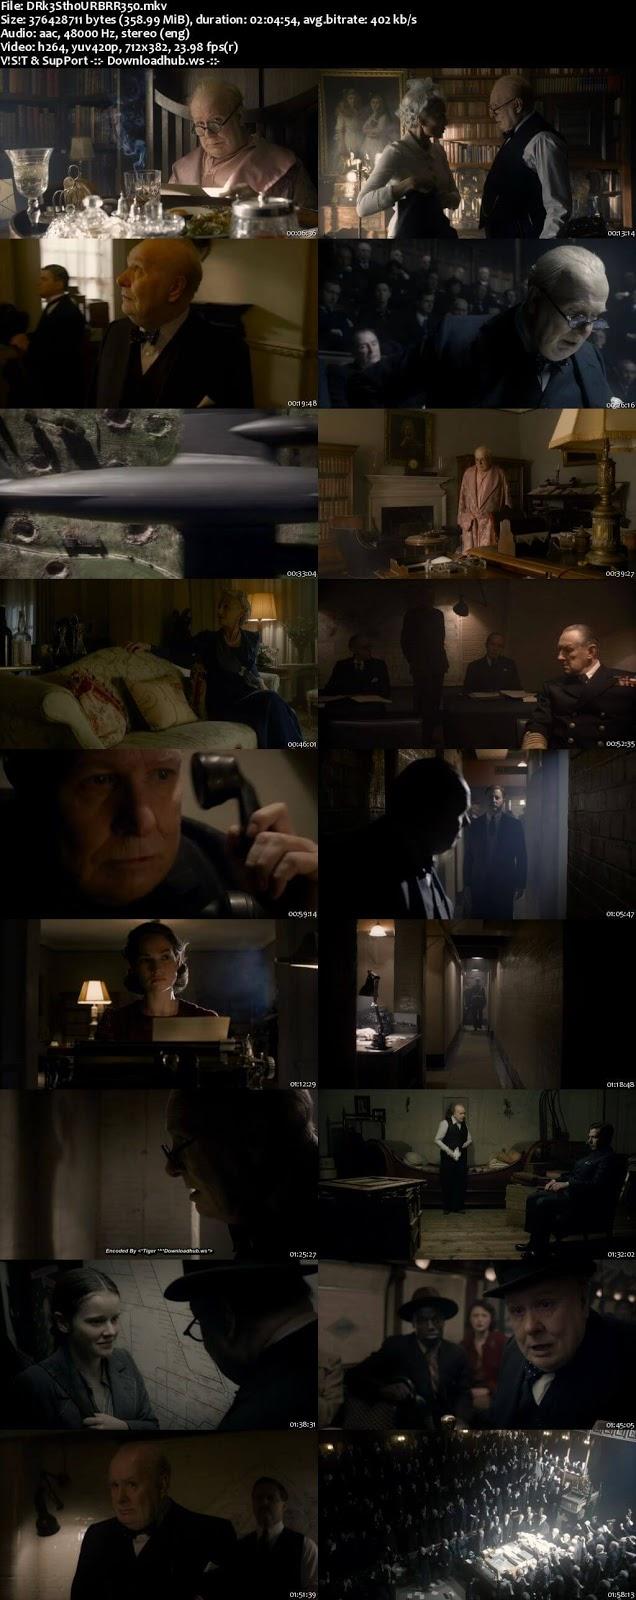 Darkest Hour 2017 English 480p BRRip ESubs